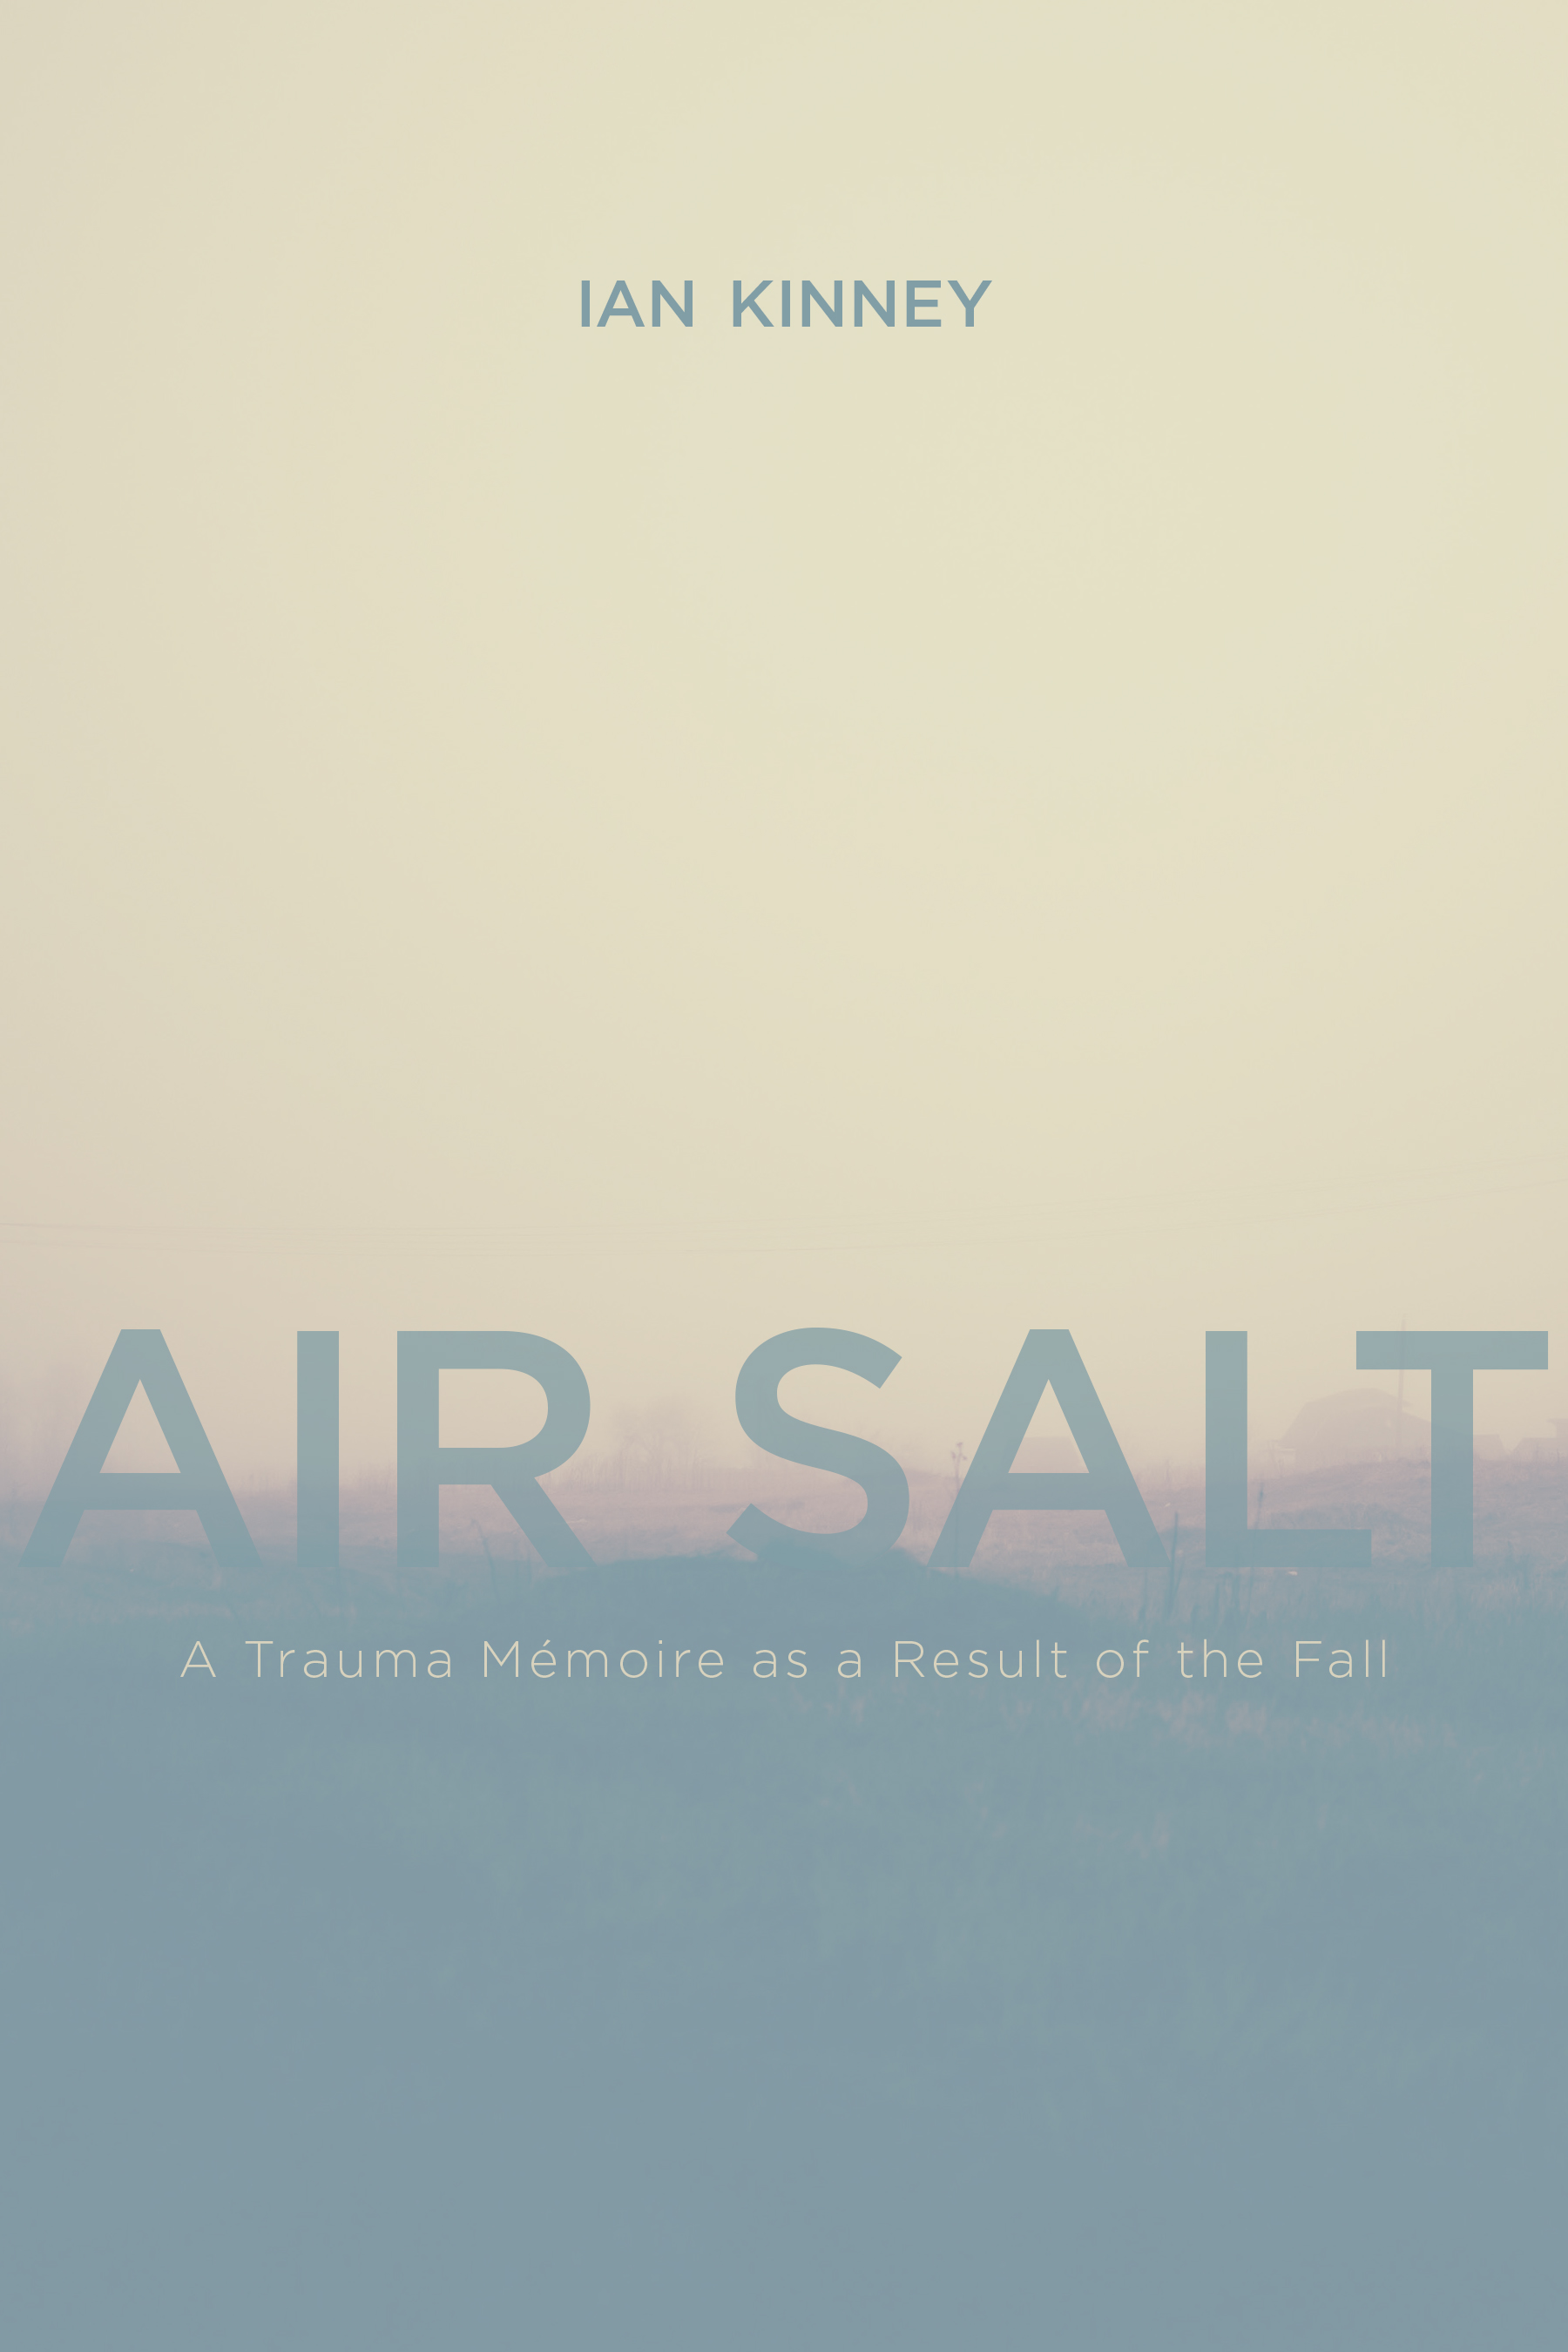 Air Salt: A Trauma Mémoire as a Result of the Fall